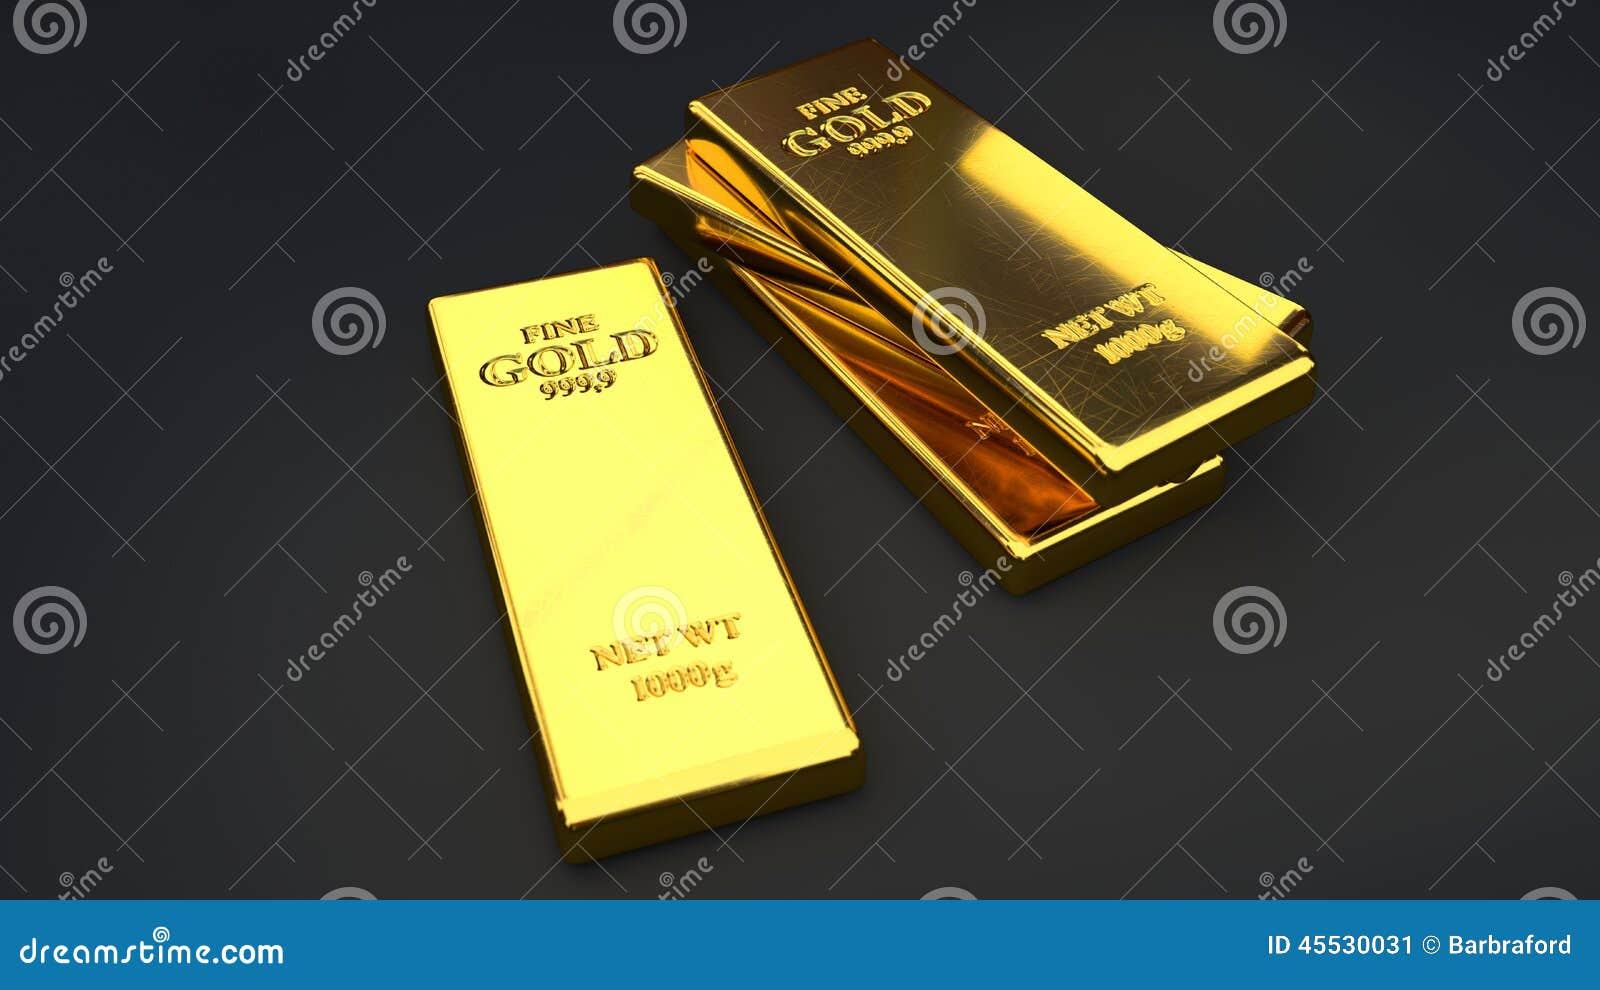 gold bar black background - photo #27